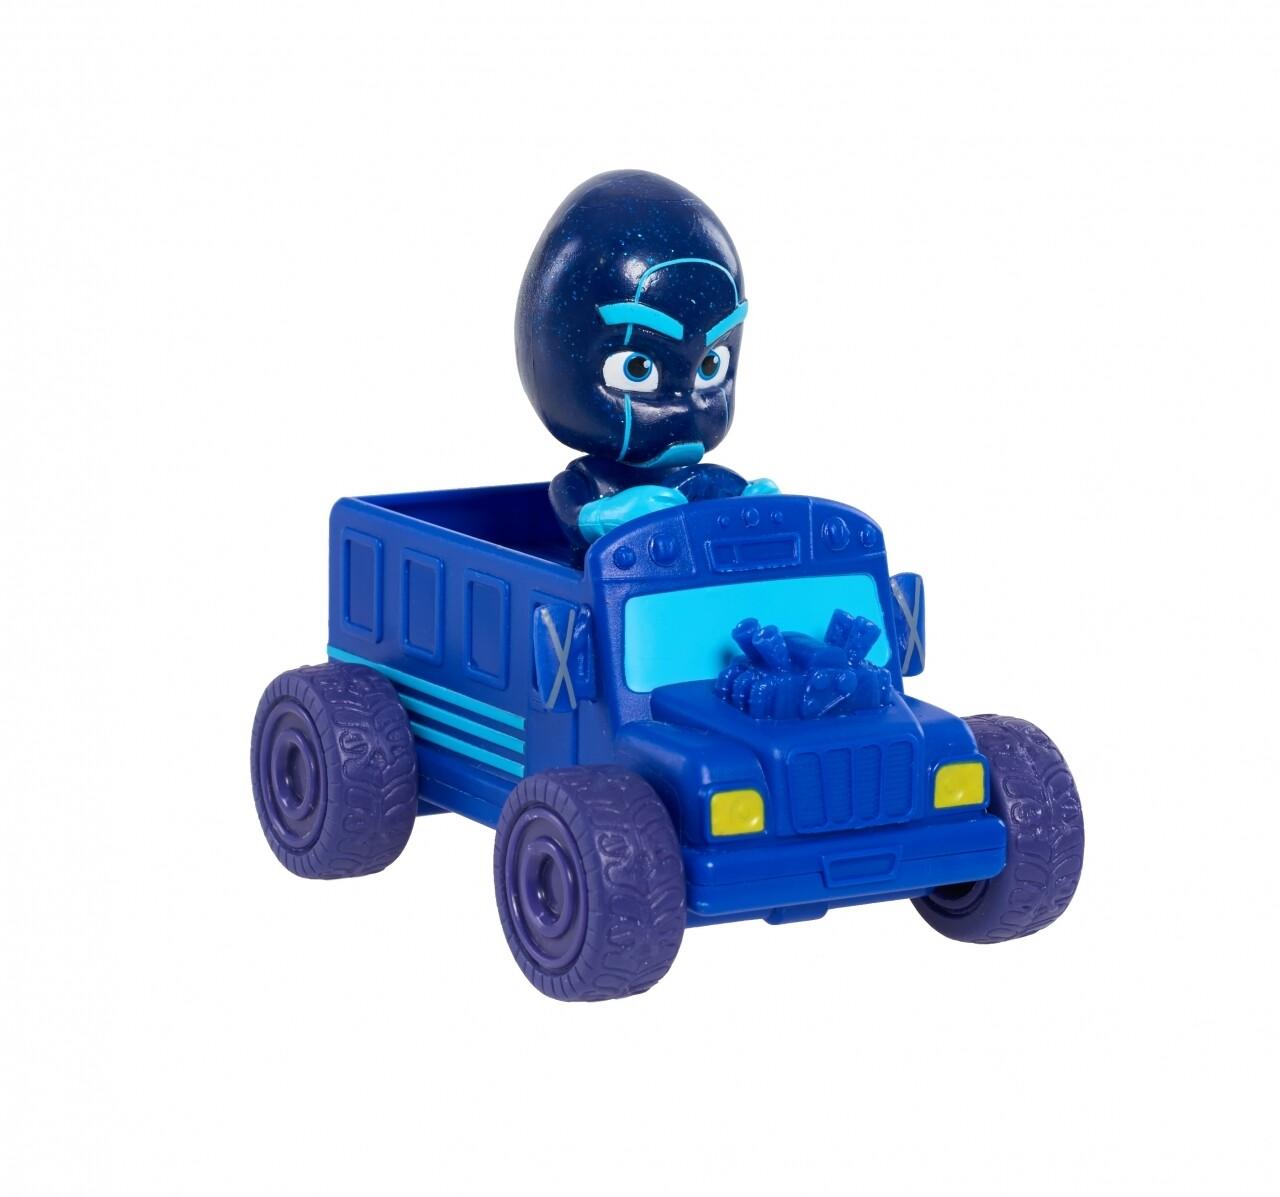 Mini vehicul Autobuzul lui Ninja